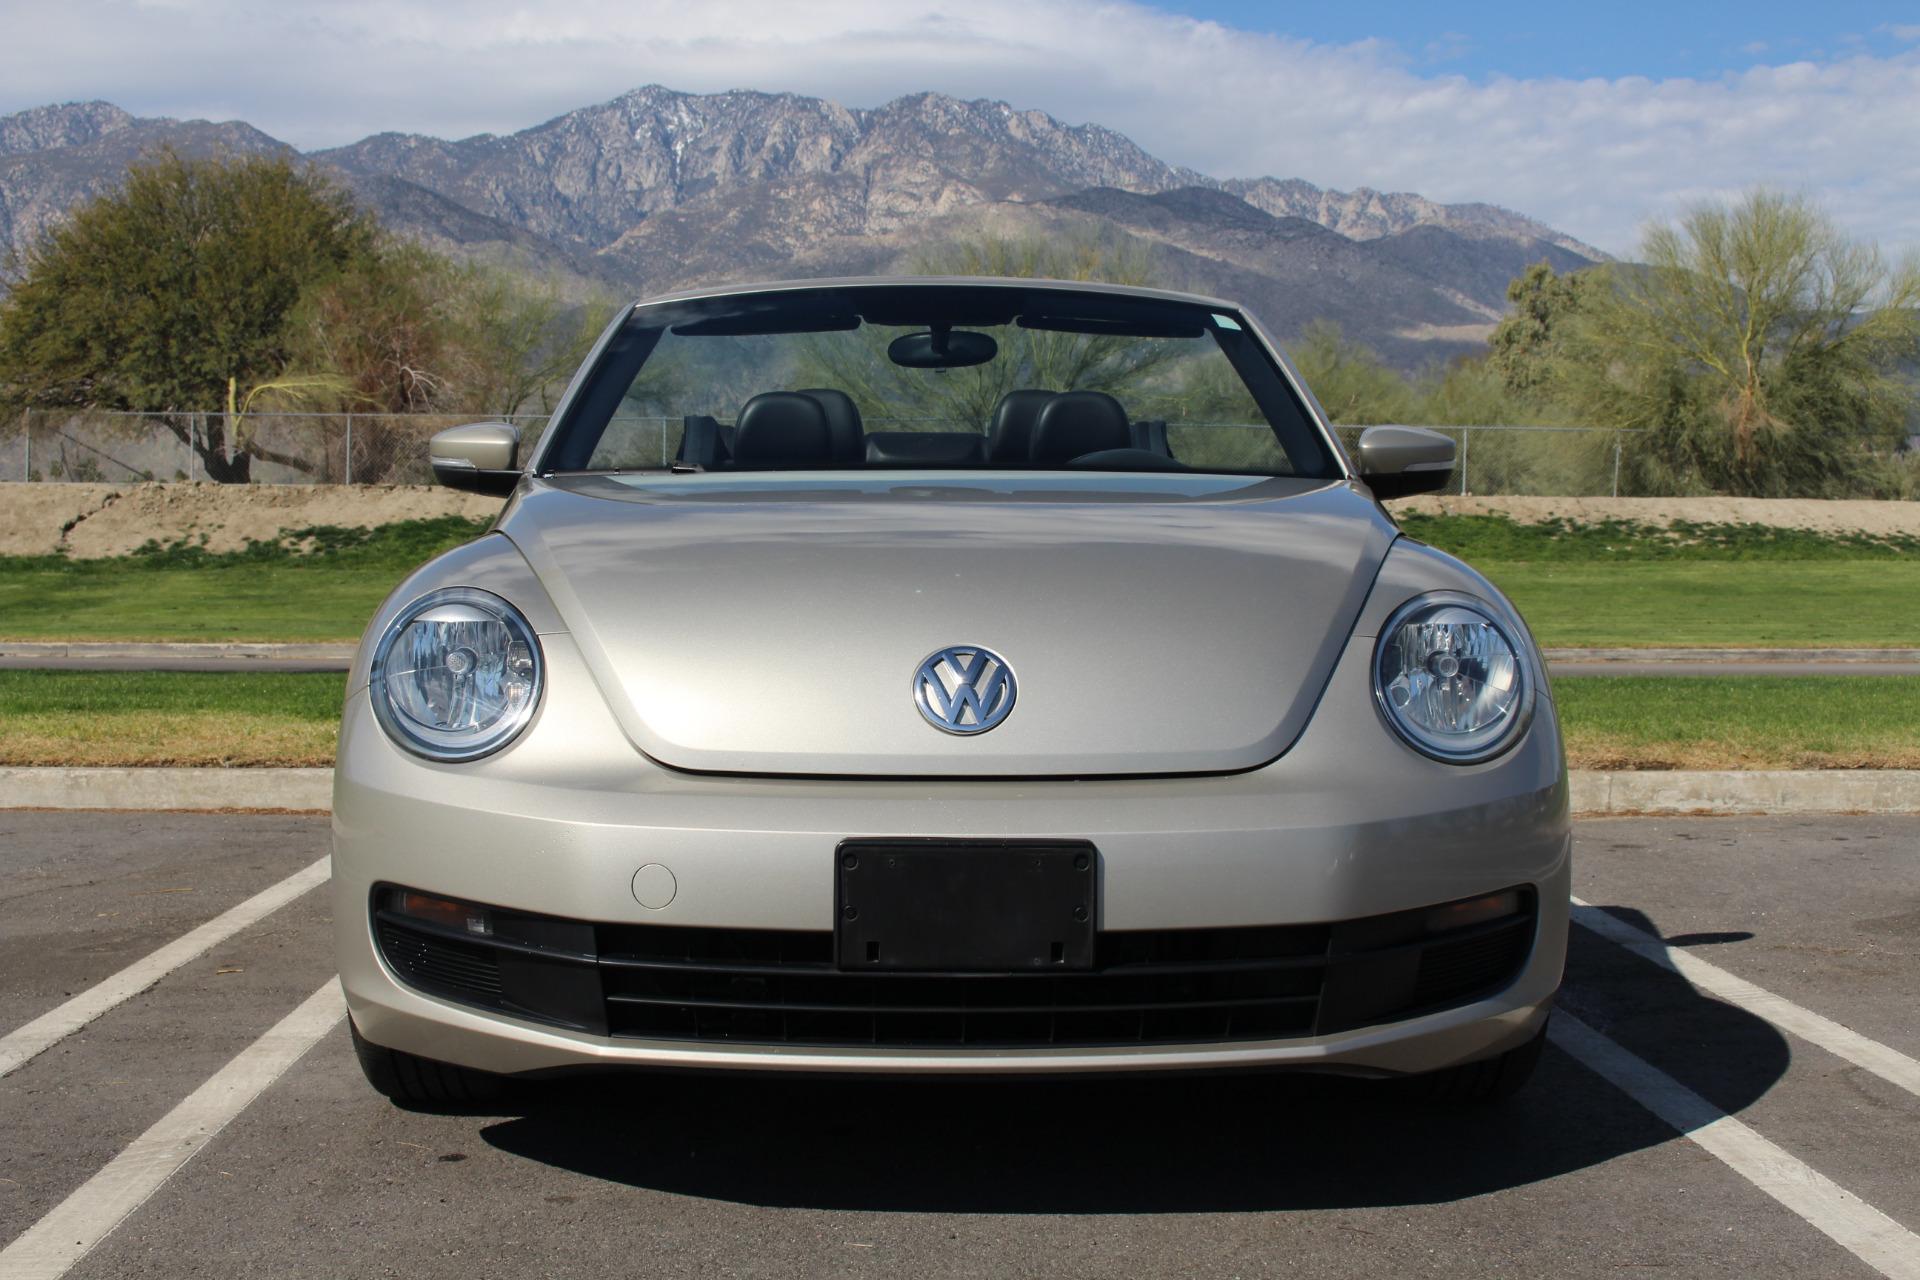 2013 Volkswagen Beetle 2 5l Pzev Stock Vw42 For Sale